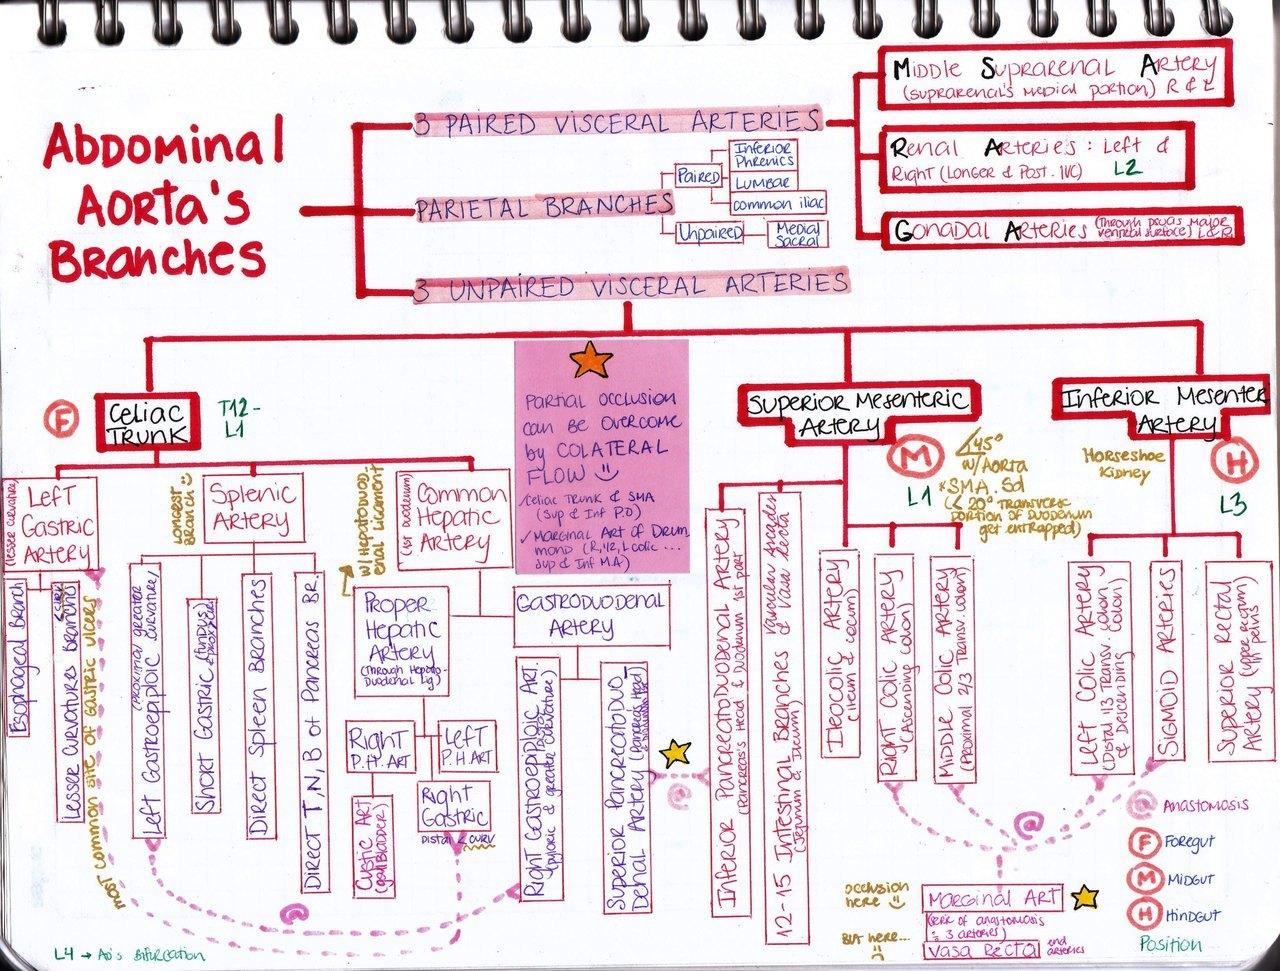 abdominal aorta diagram gefran pressure transducer wiring my notes for usmle  aortas branches